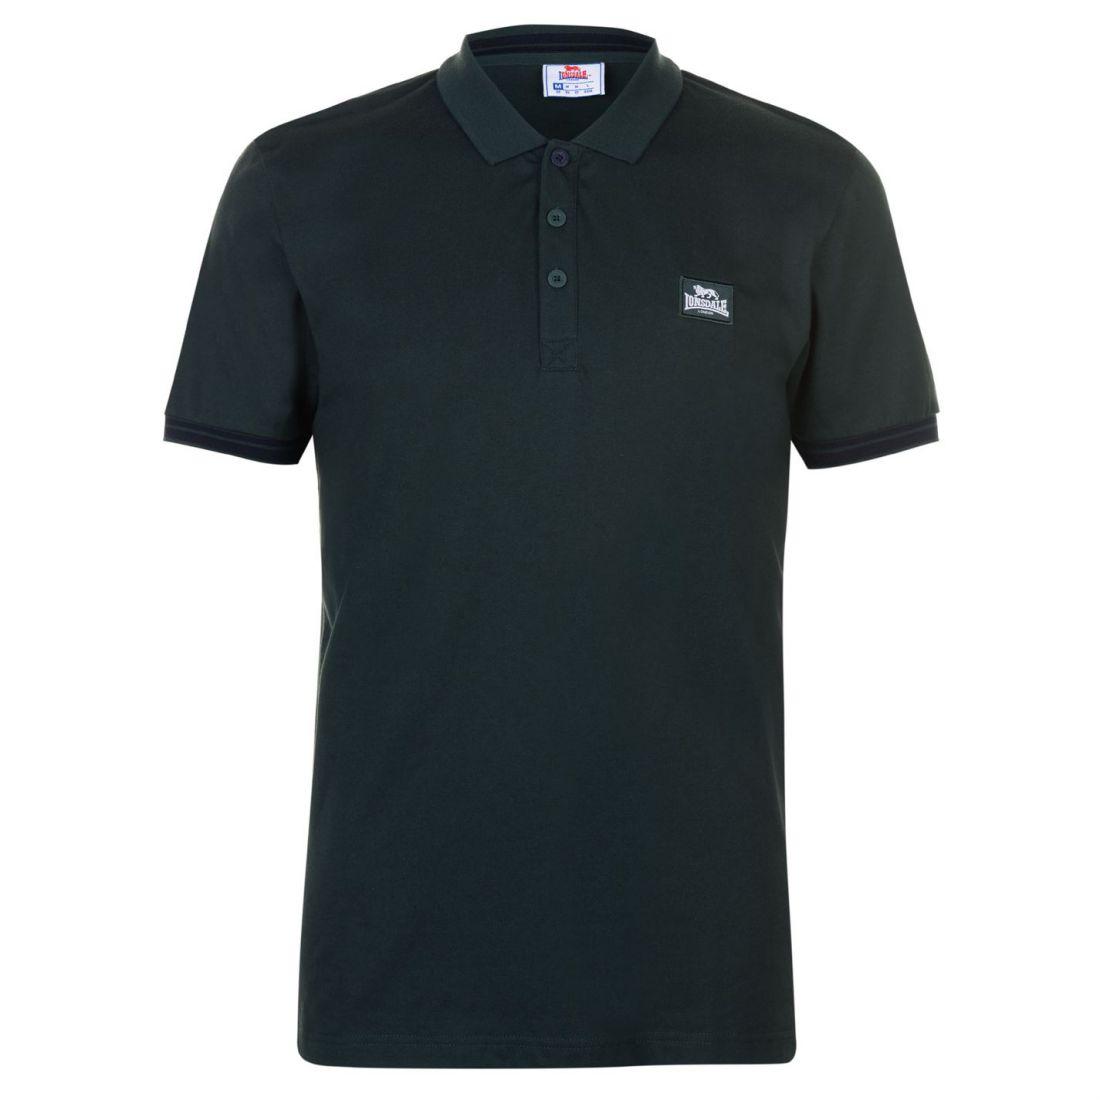 Jersey Camisa de Polo Lonsdale Caballeros Classic Fit Camiseta Top para Hombre Manga Corta Botón